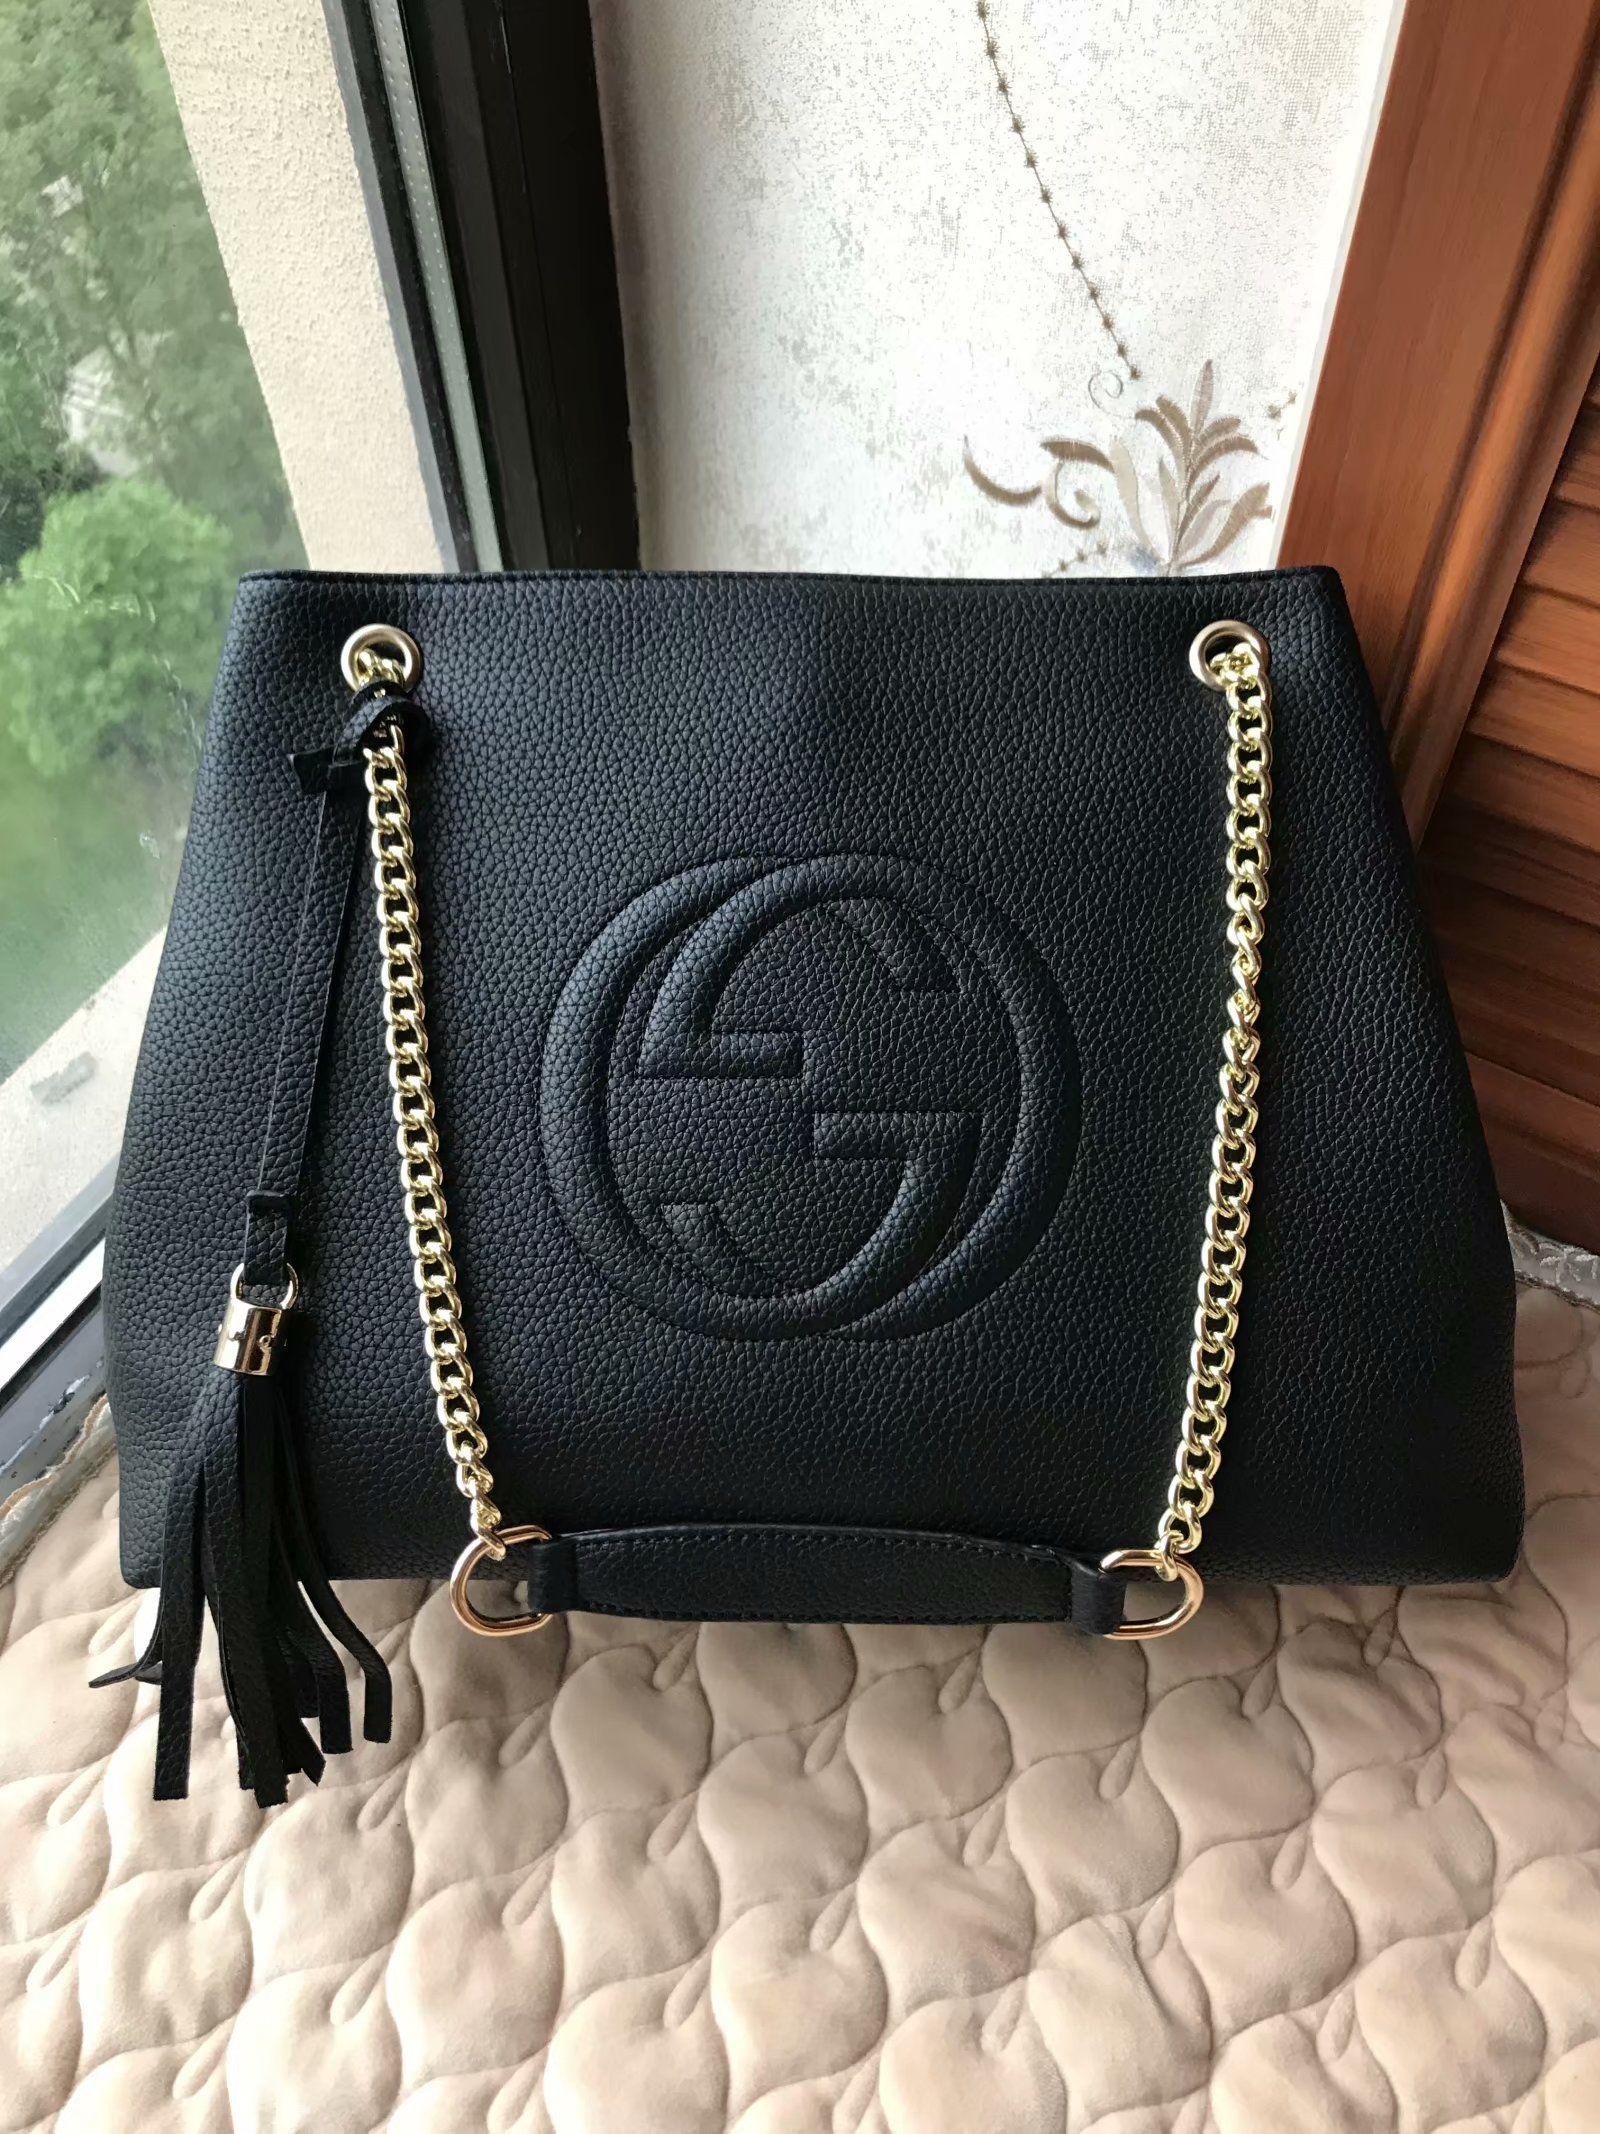 a6a9248e8aa4 Fashion Woman Bag 2018 Ladies Handbags Designer Bags Women Tote Bag ...